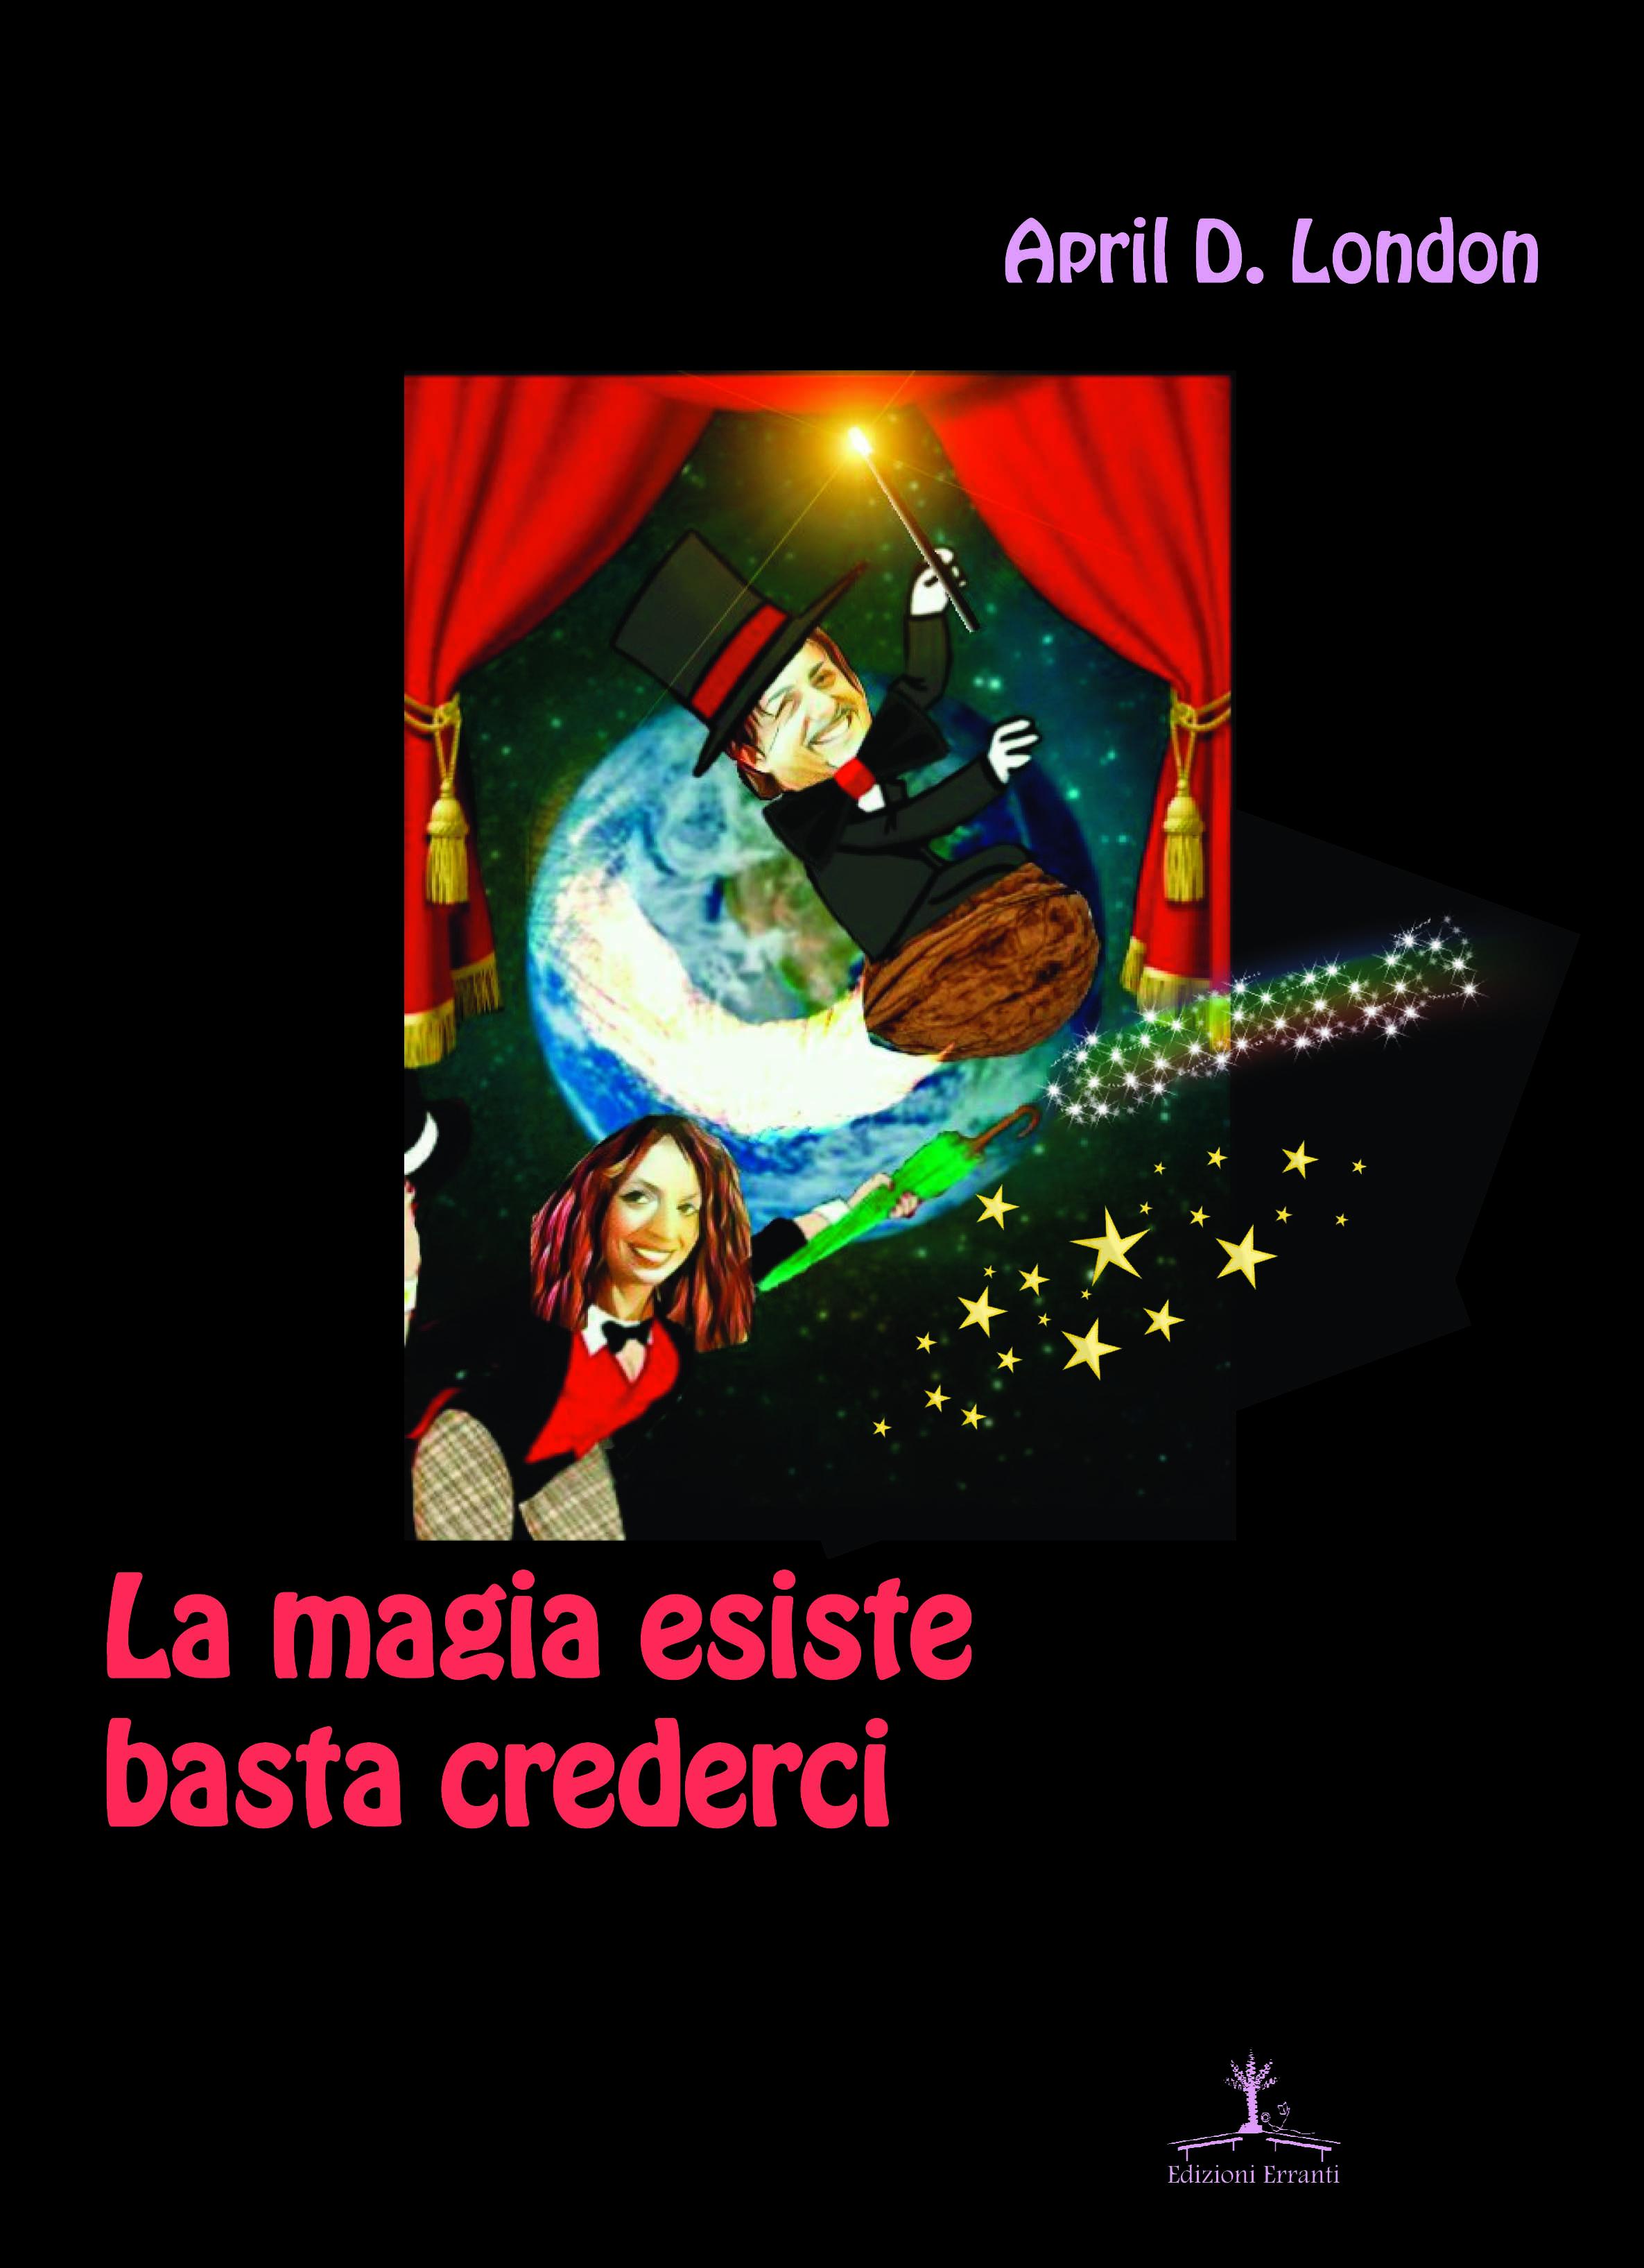 Copertina_la_magia_esiste_def-copia